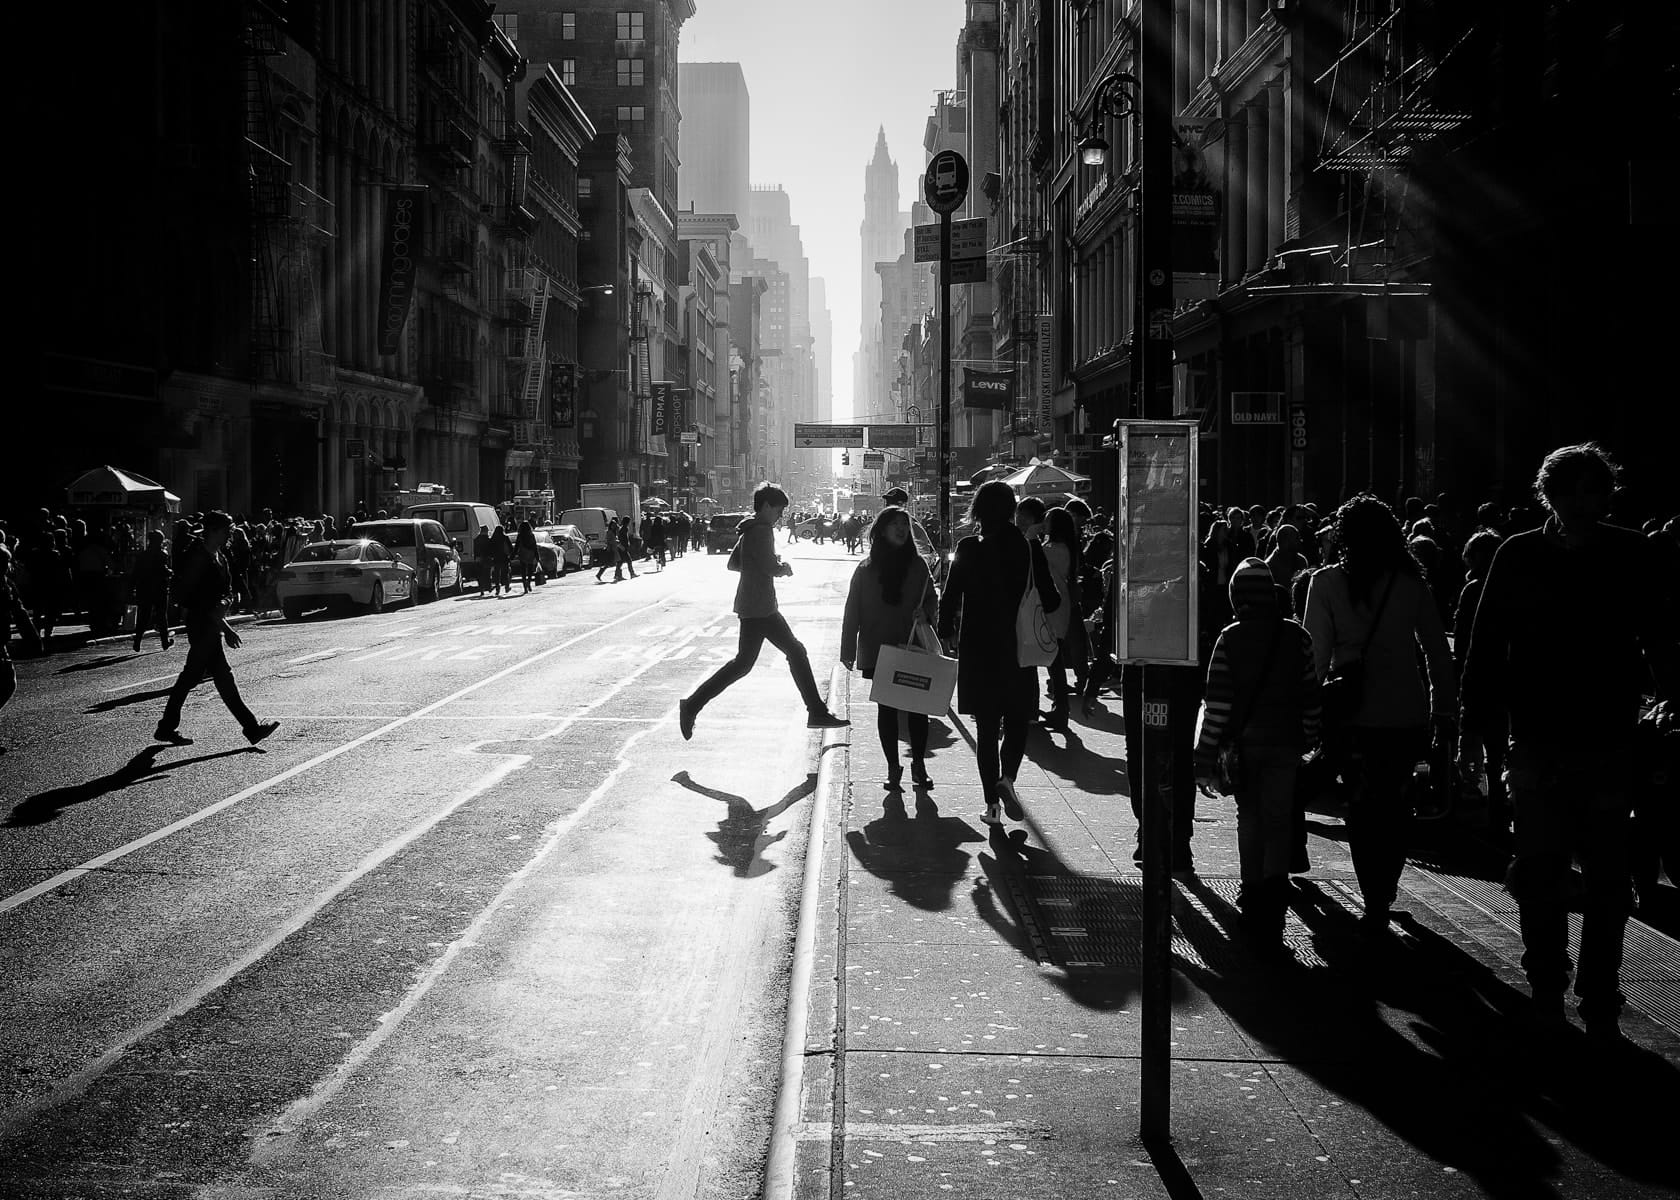 """Decisive moment"" submission by Patrick Monnier"